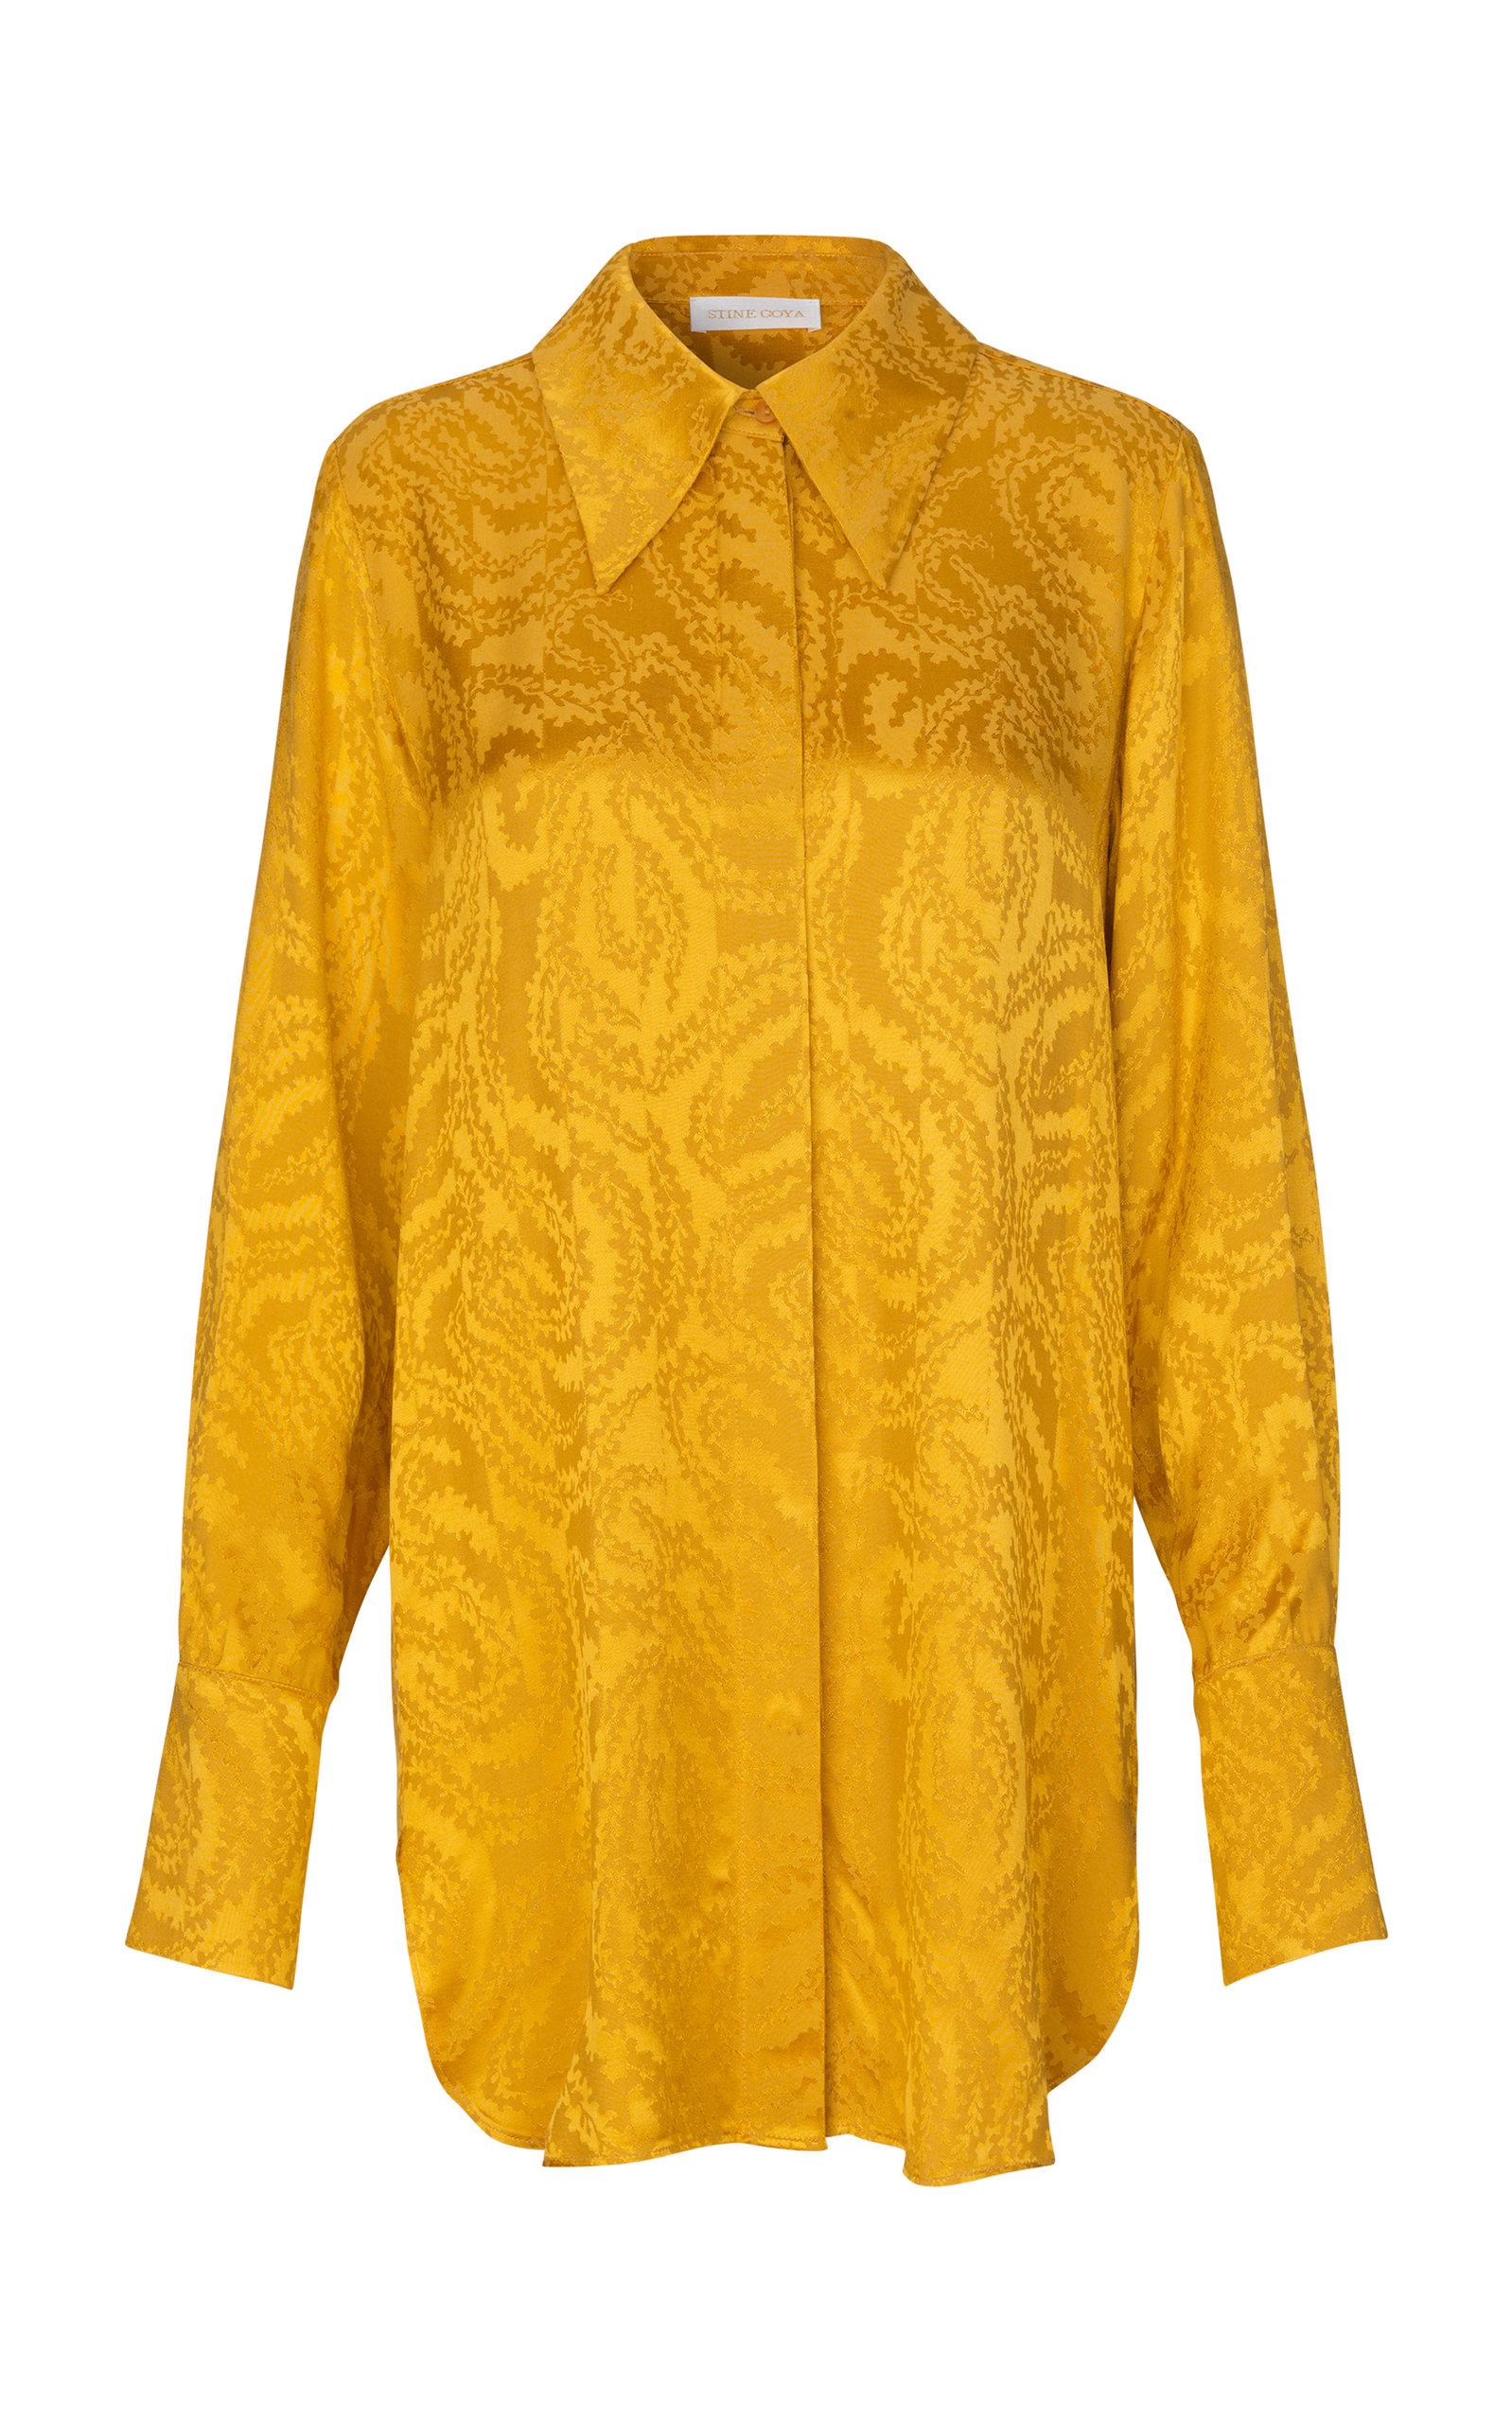 Stine Goya CLOTILDE EXAGGERATED COLLAR TOP